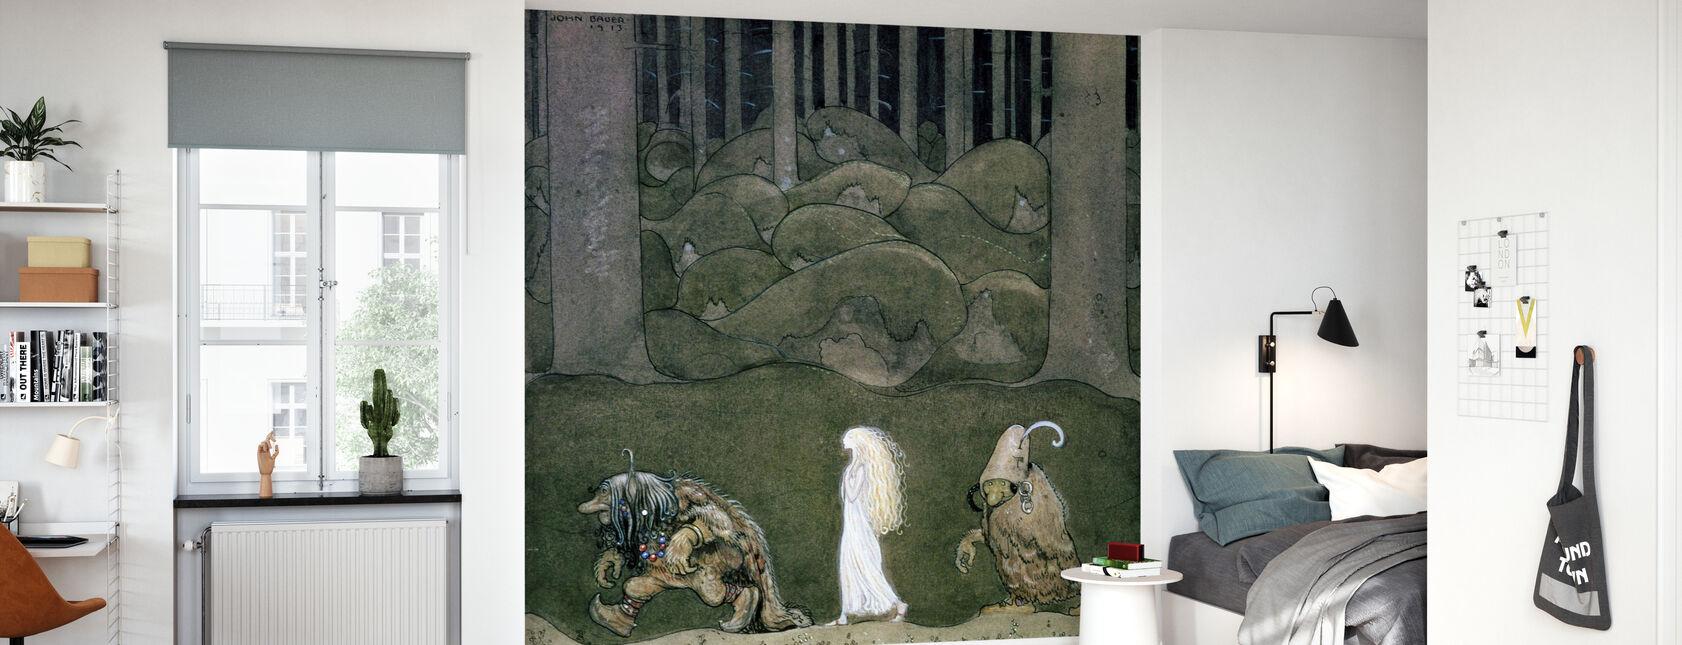 Princess and the Trolls - John Bauer - Wallpaper - Kids Room